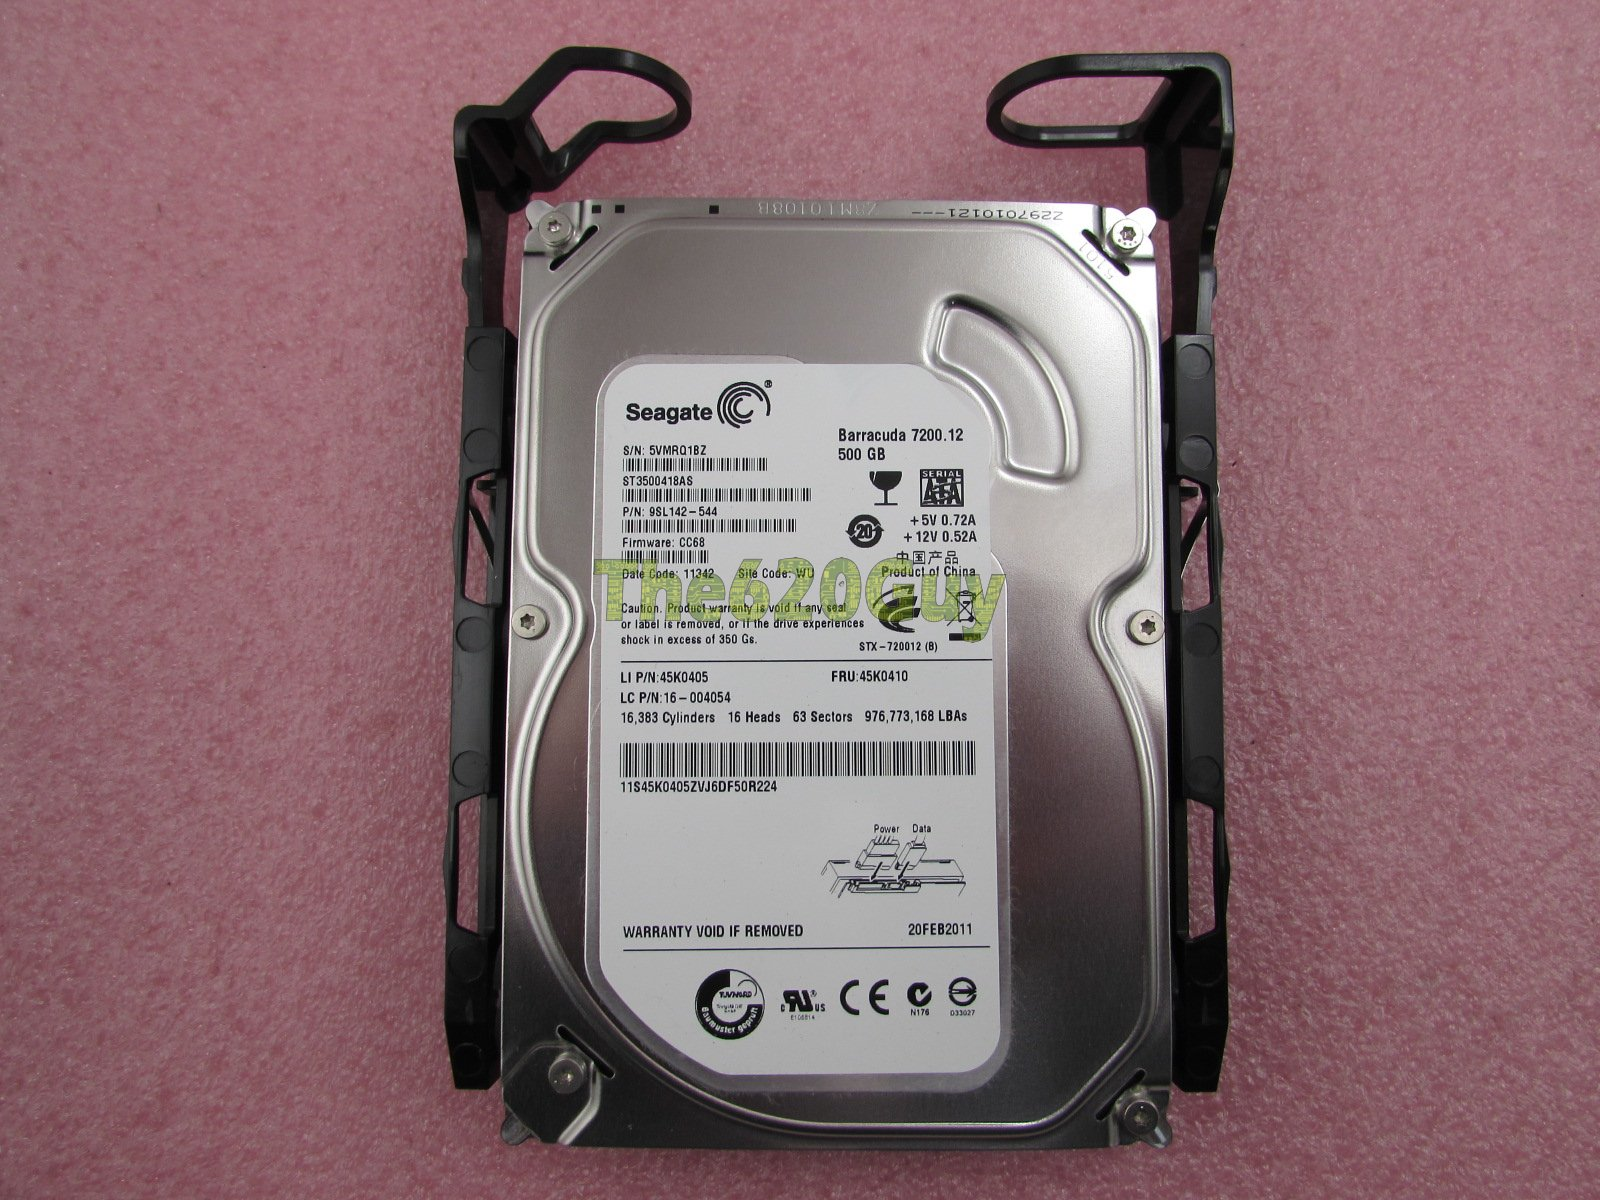 Lenovo ThinkCentre A30 Seagate Barracuda HDD Drivers for Mac